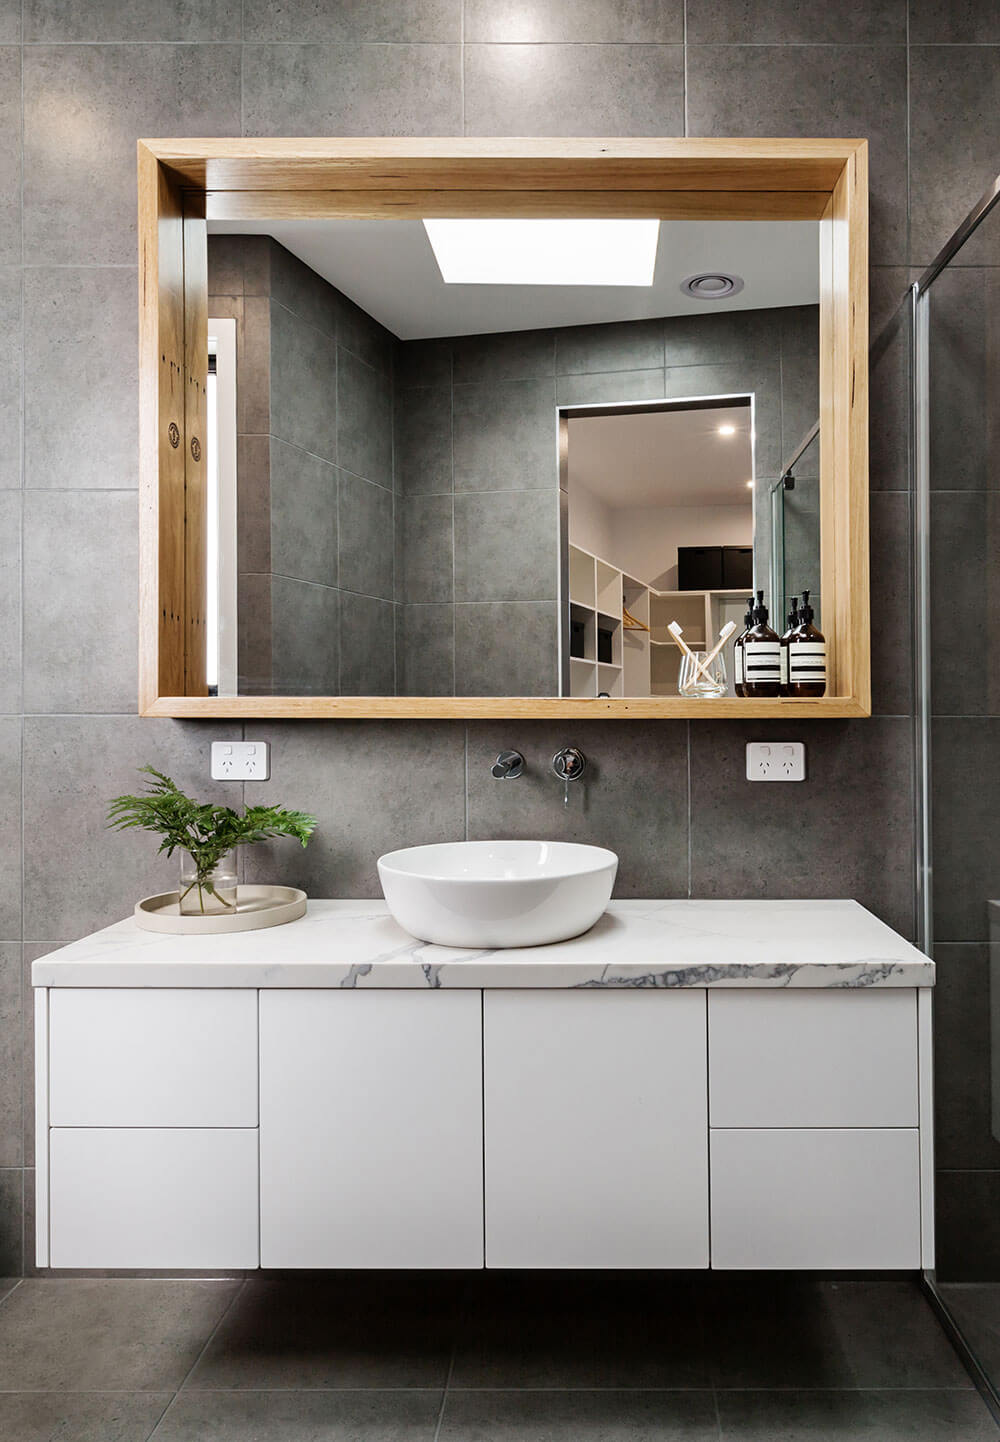 Glen Iris main bathroom renovation services